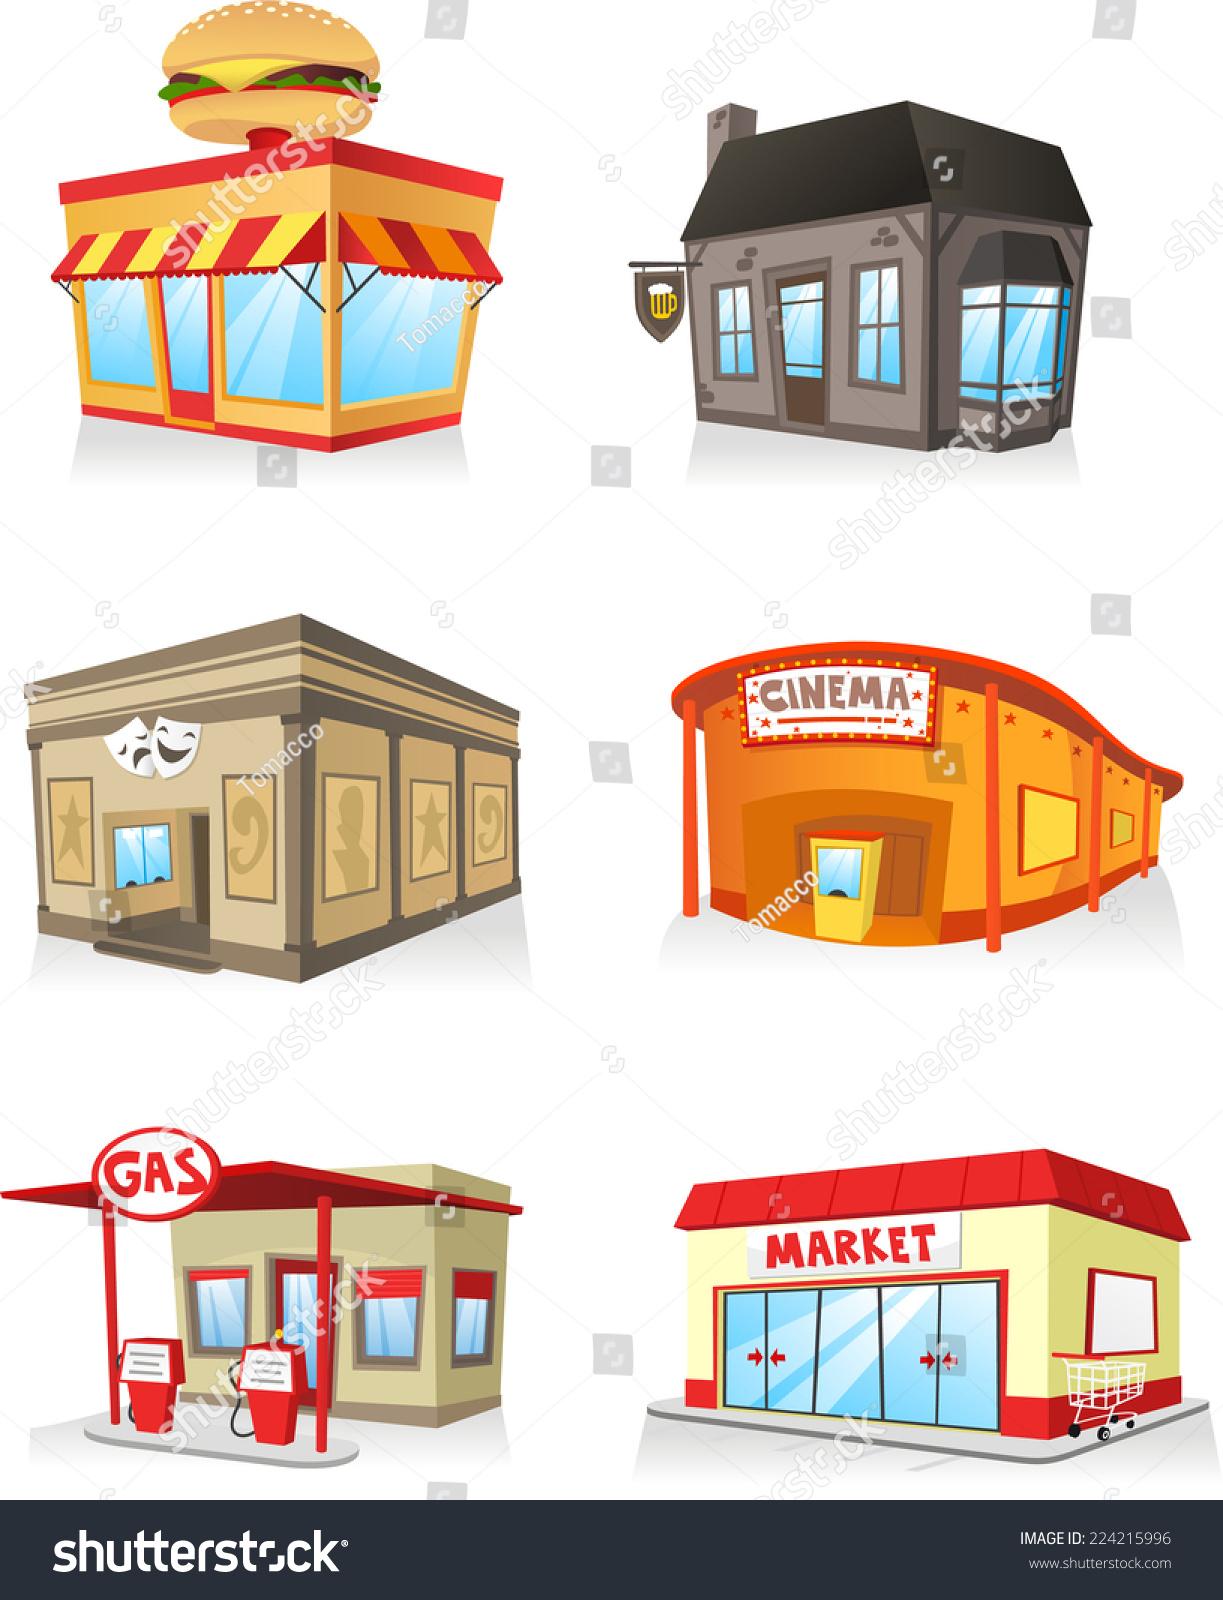 Public Building Cartoon Set Fast Food Stock Vector ...  Cinema Building Cartoon